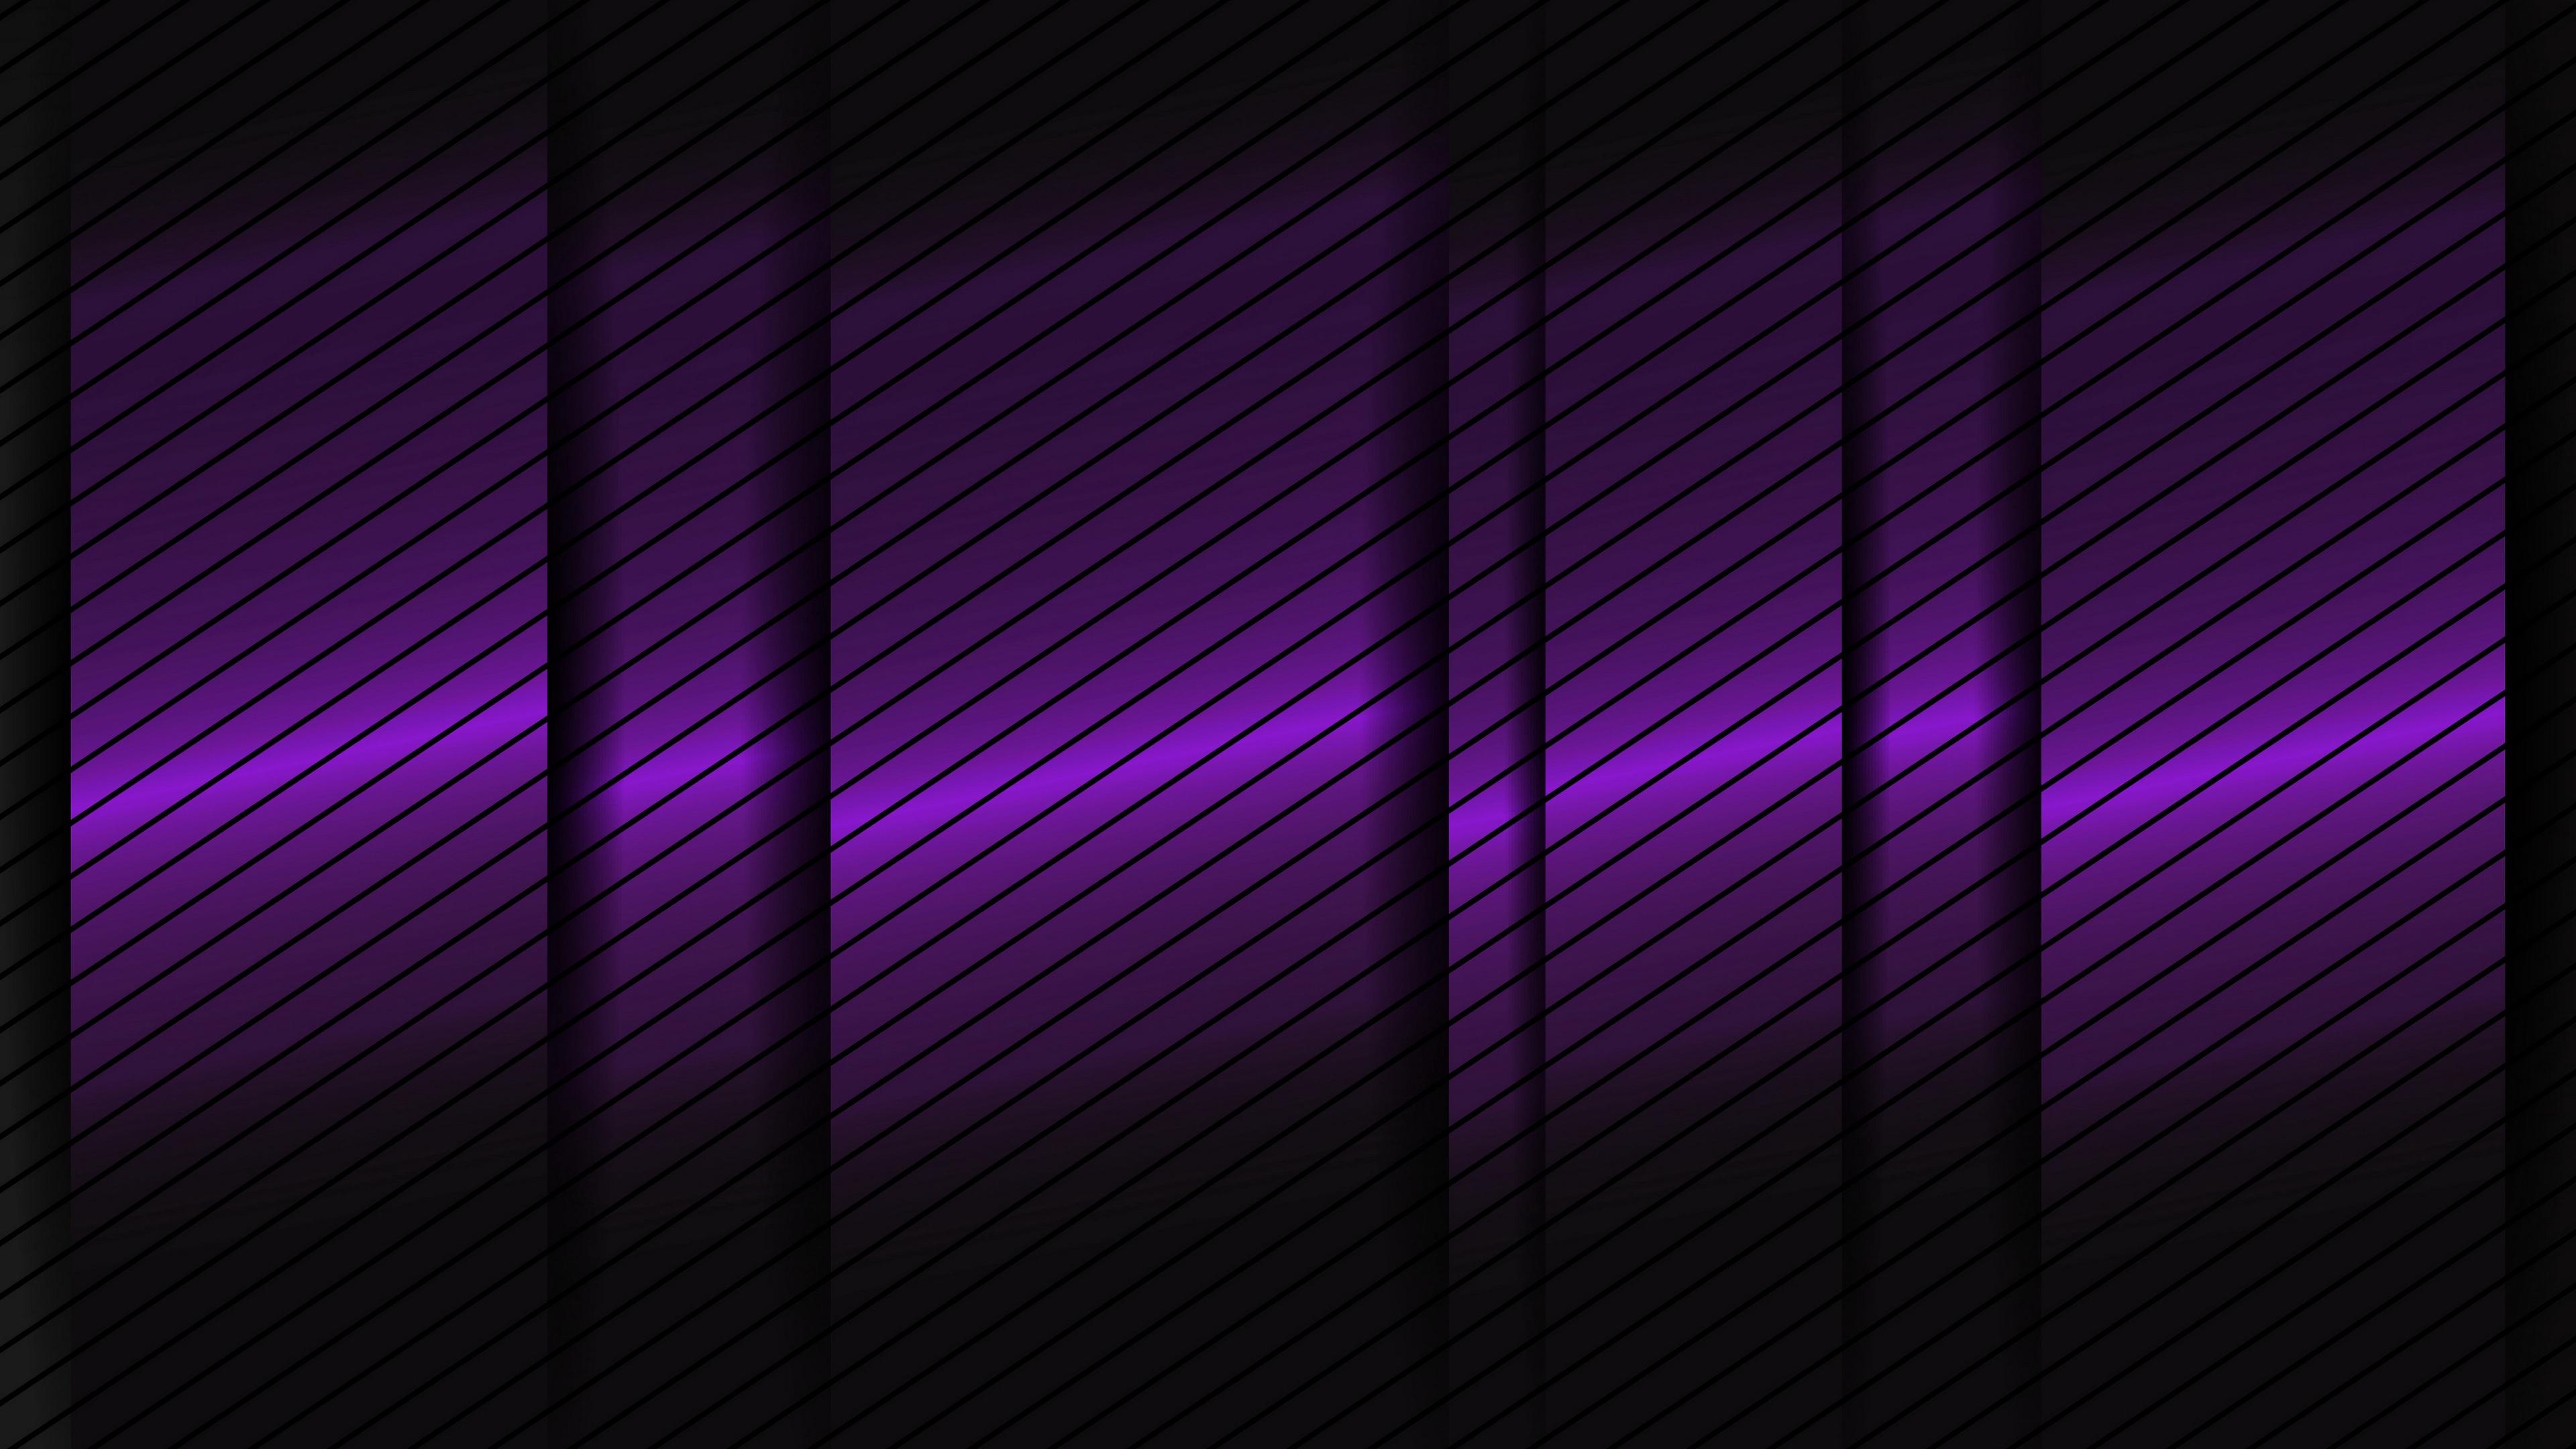 abstraction line purple 4k 1539370571 - abstraction, line, purple 4k - Purple, Line, Abstraction